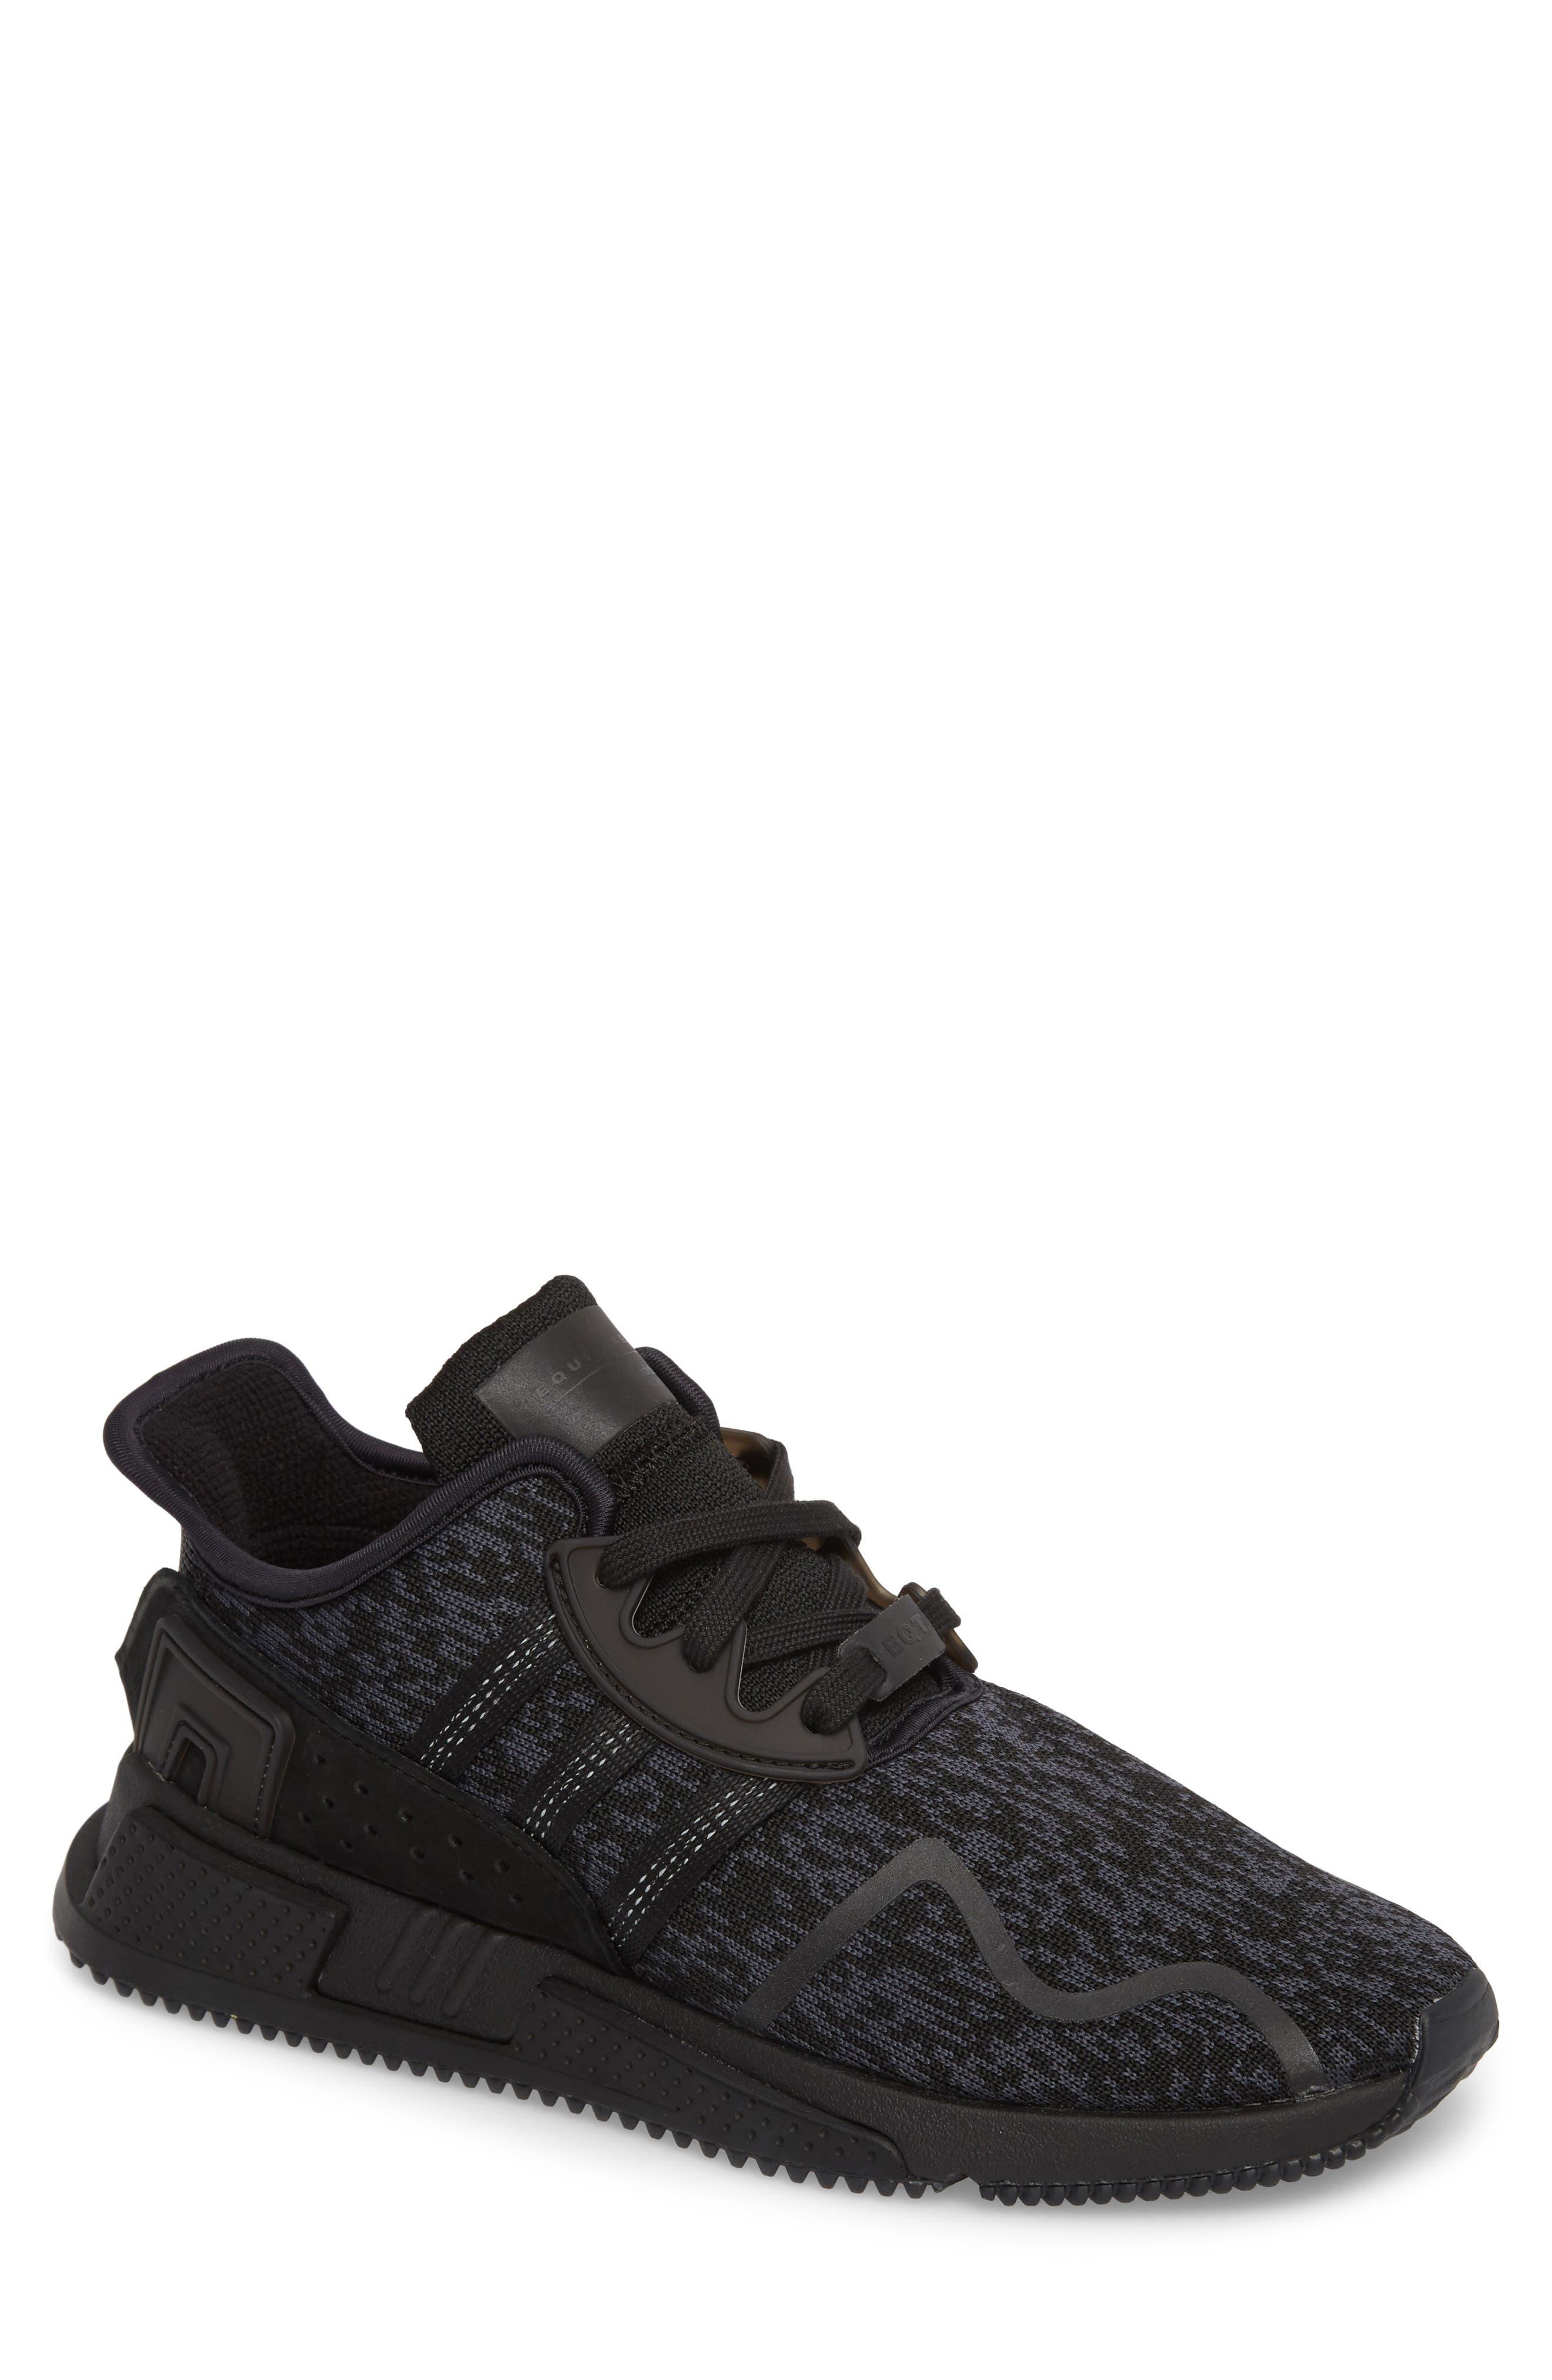 Alternate Image 1 Selected - adidas EQT Cushion ADV Sneaker (Men)